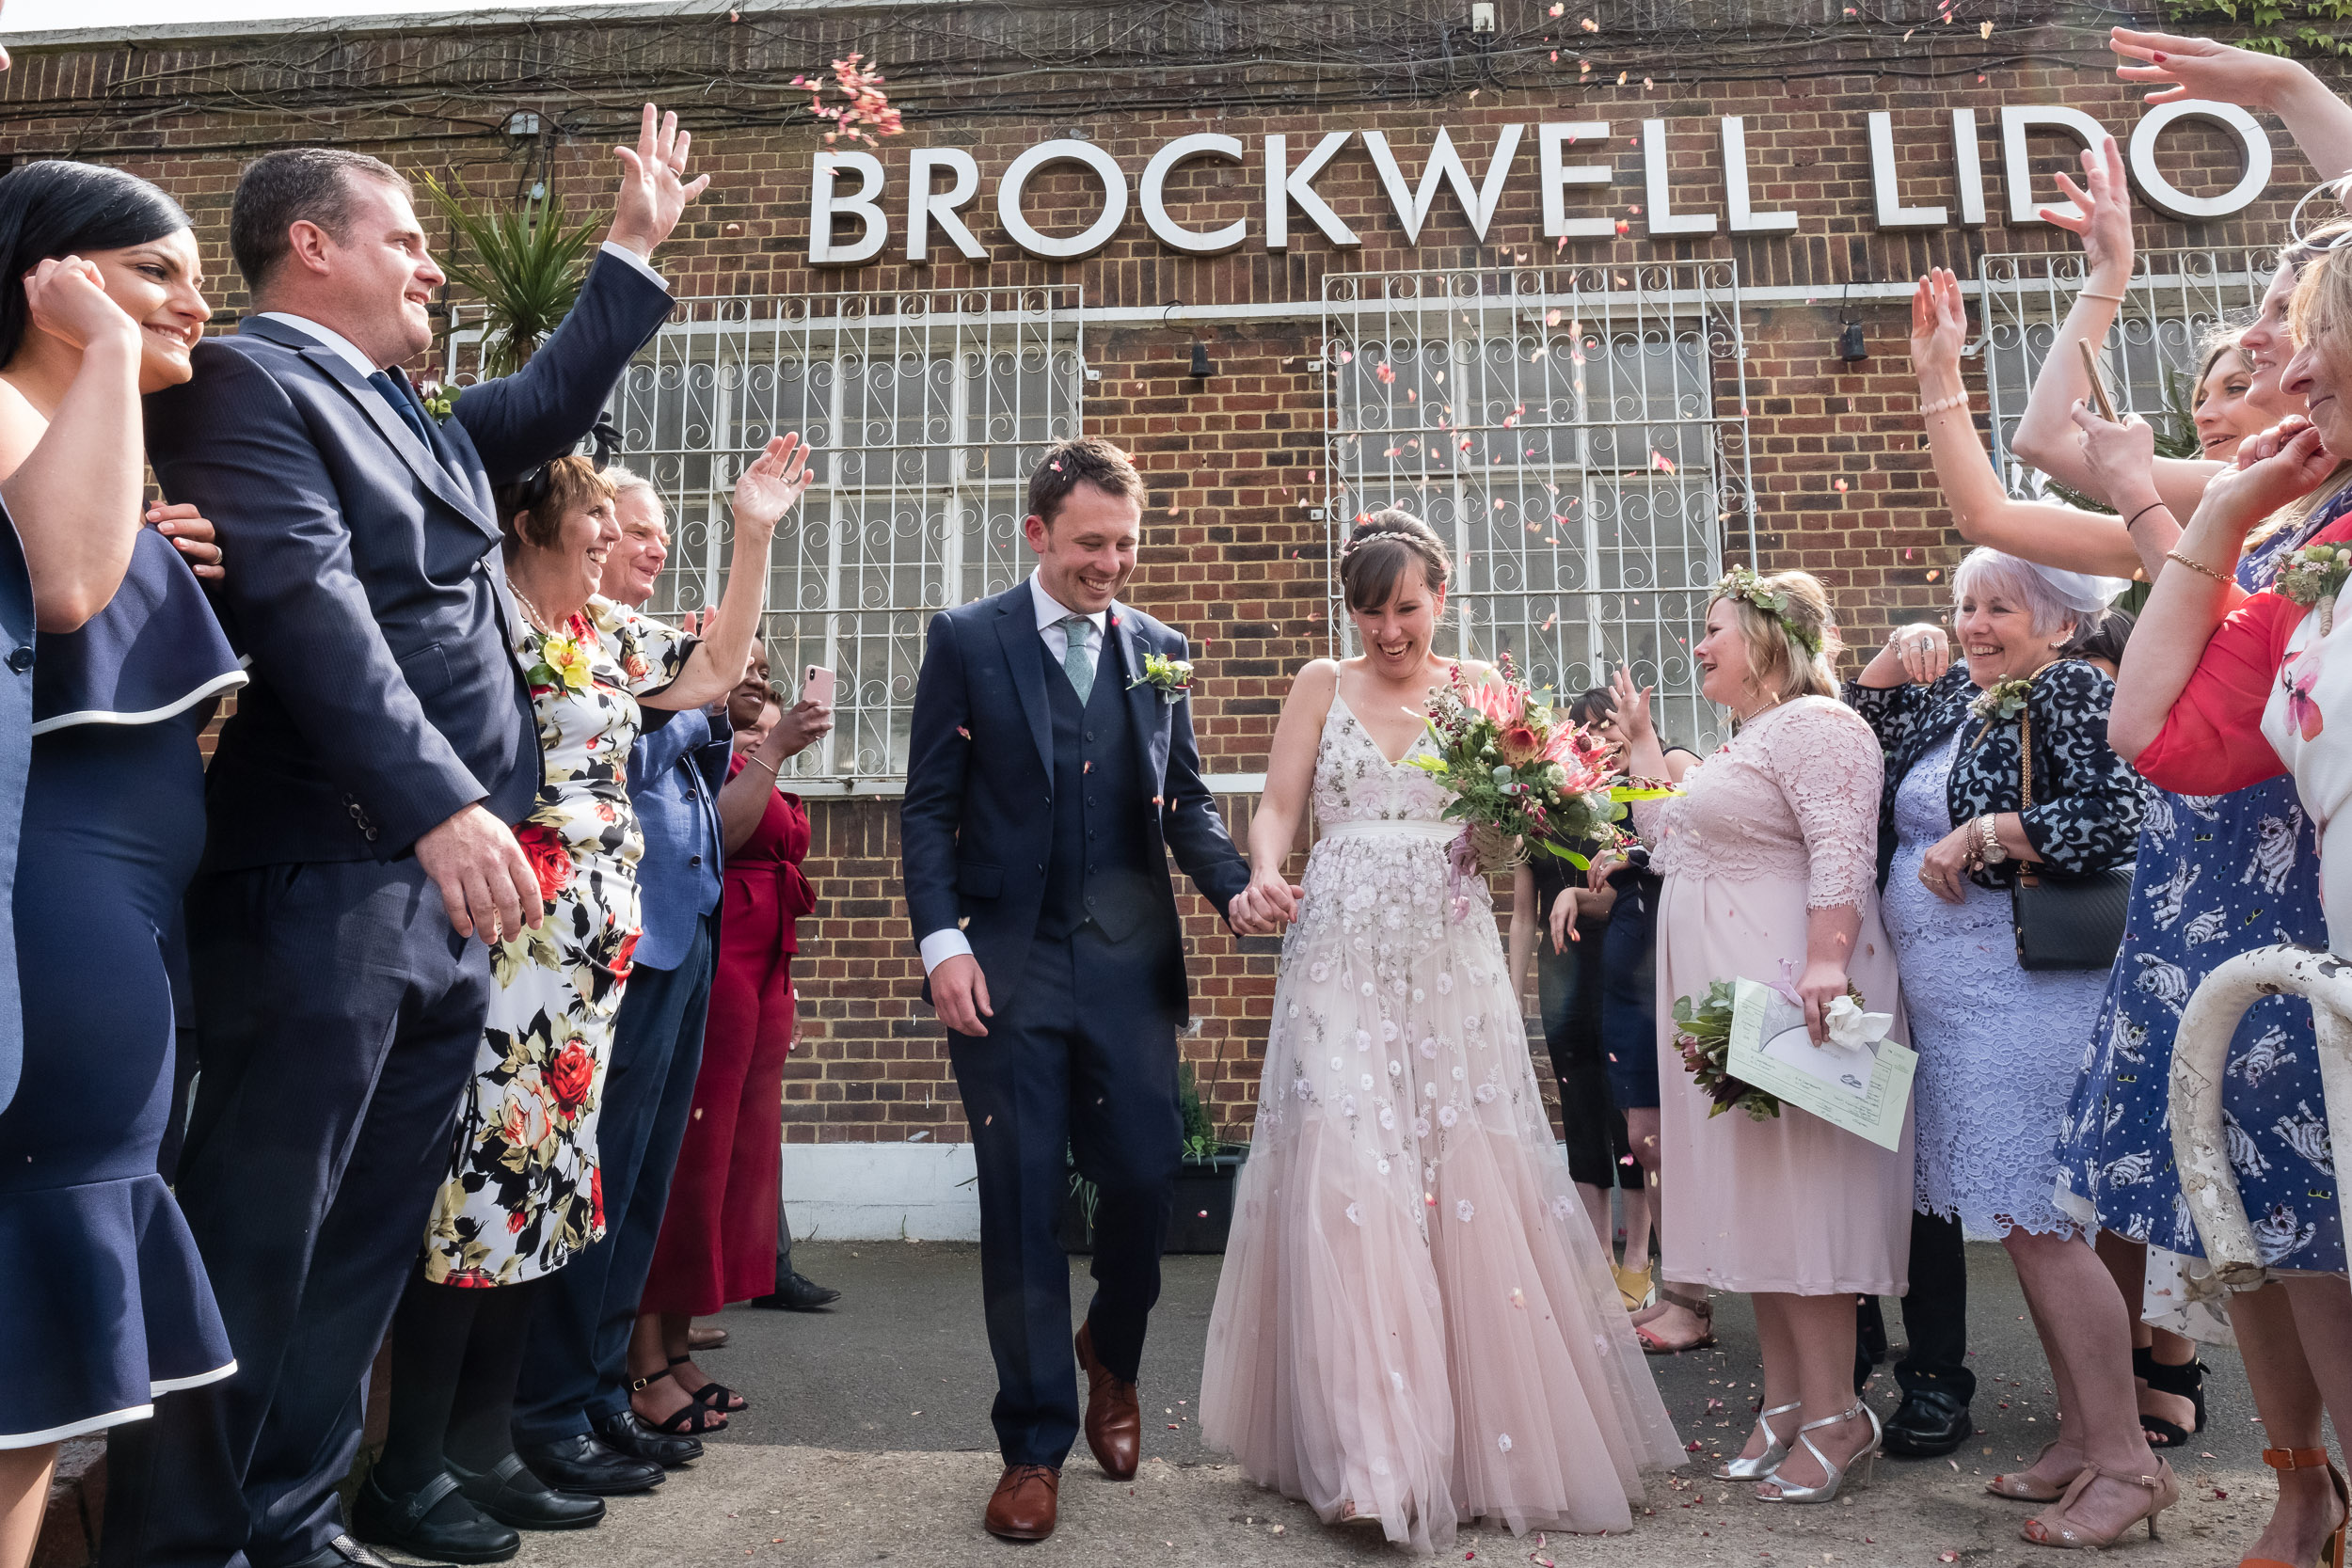 brockwell-lido-brixton-herne-hill-wedding-207.jpg